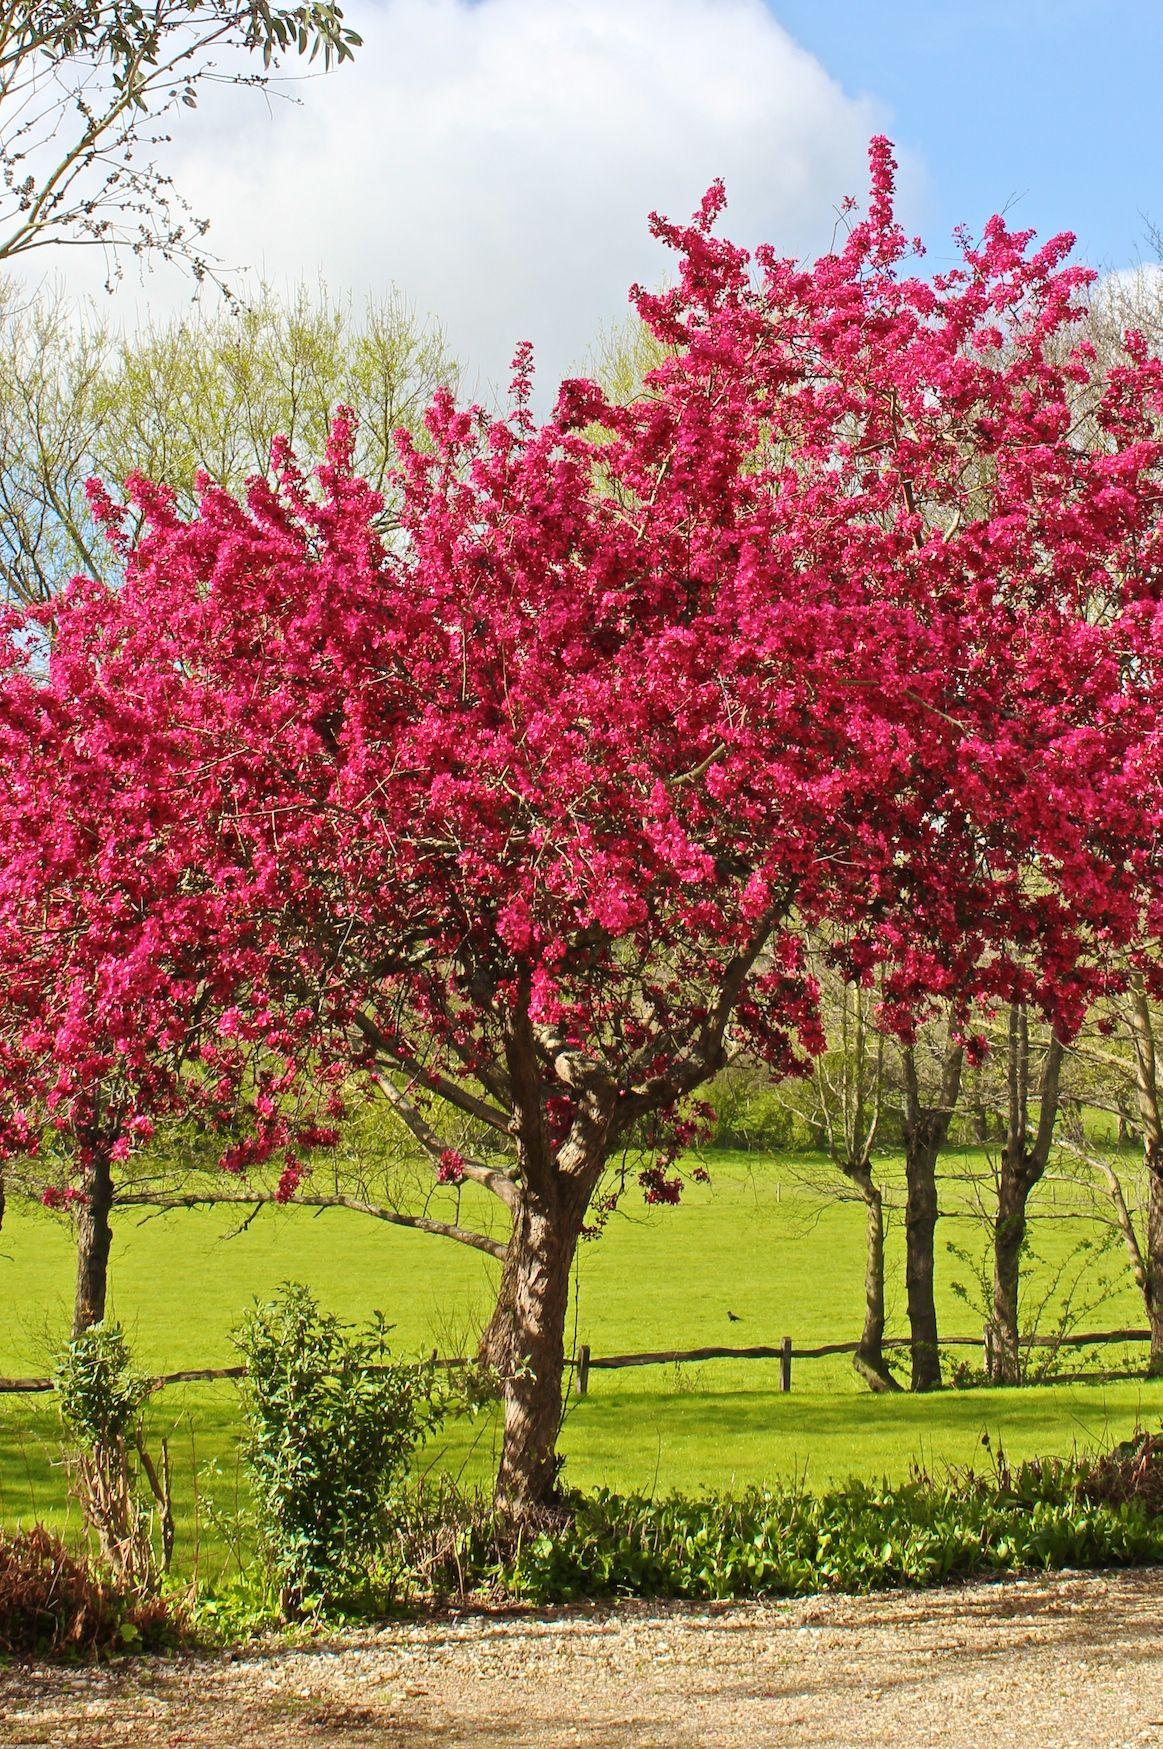 Hawthorn Crataegus Laevigata Paul S Scarlet Blooms In May